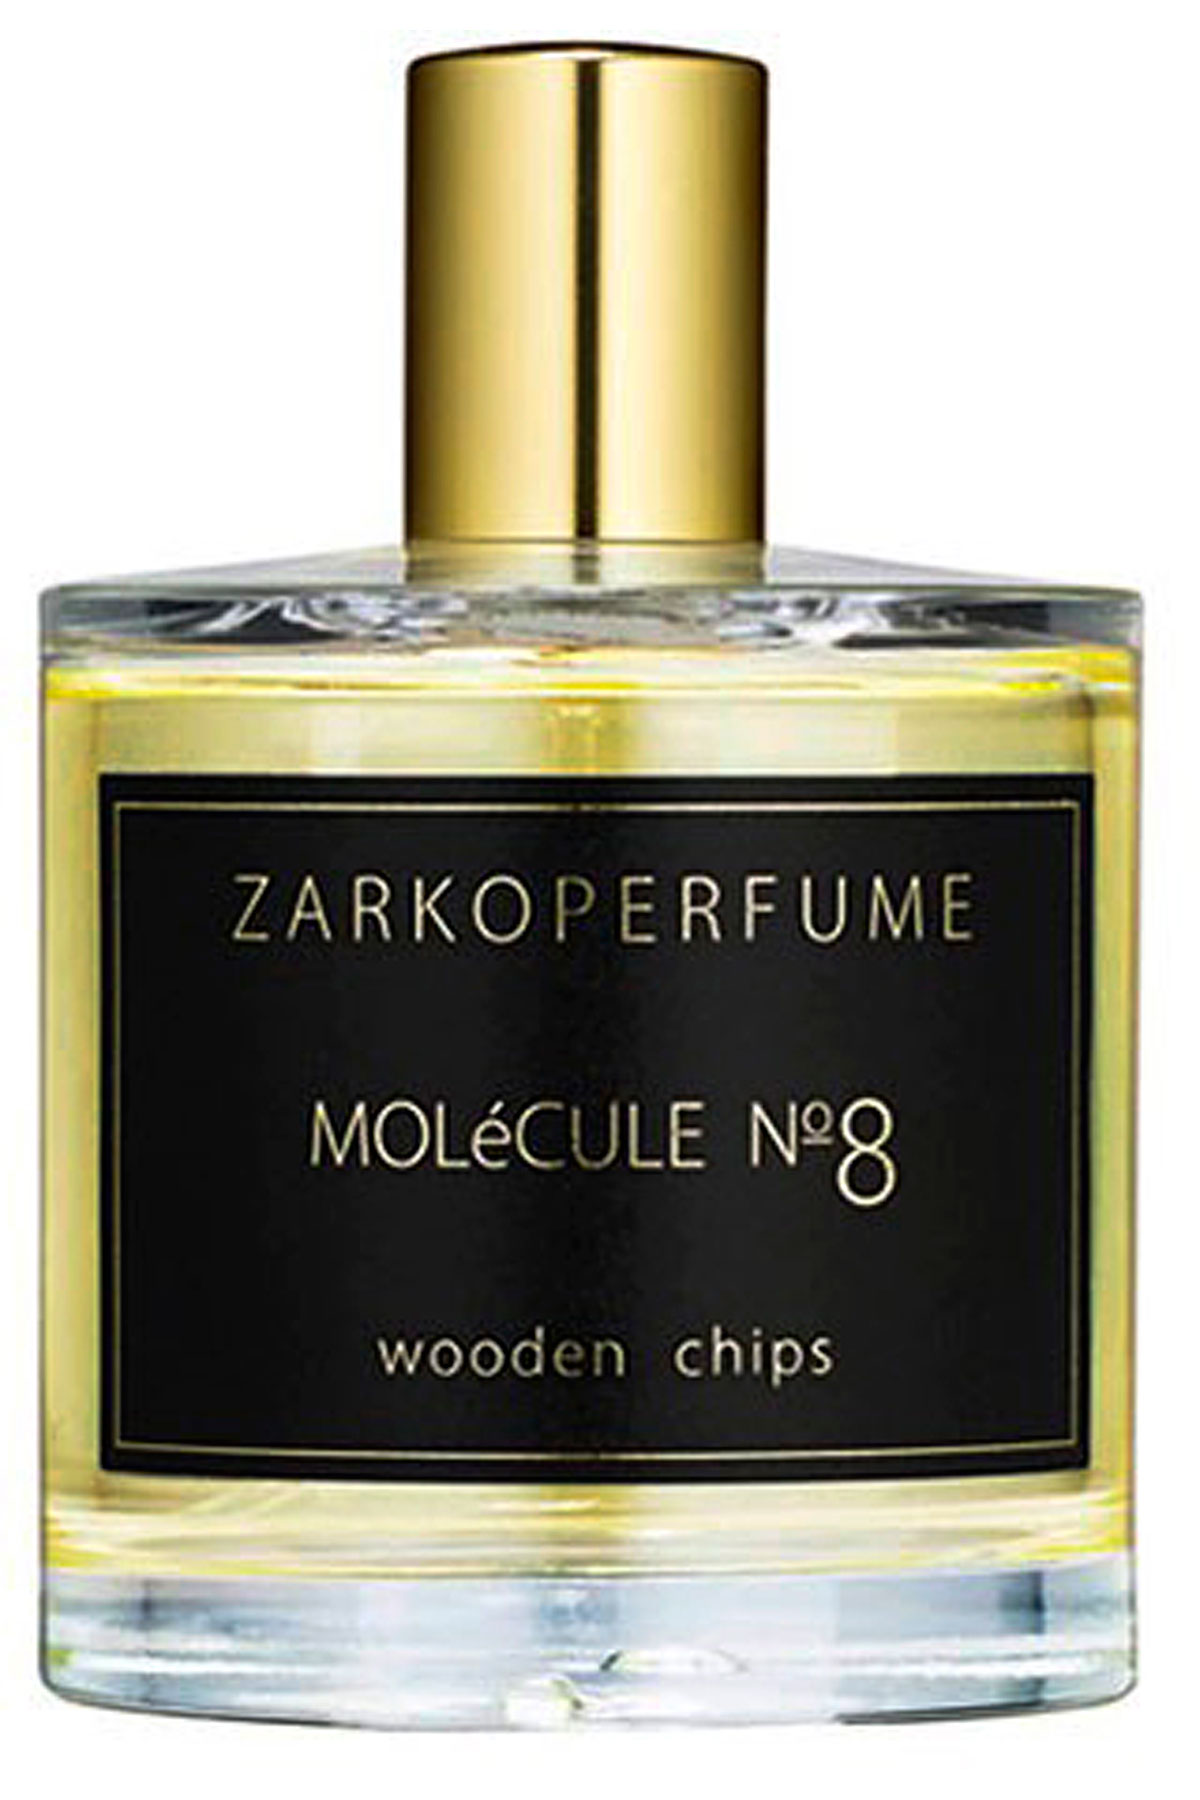 Zarkoperfume Fragrances for Women, Molecule N.8 Wooden Chips - Eau De Parfum - 100 Ml, 2019, 100 ml